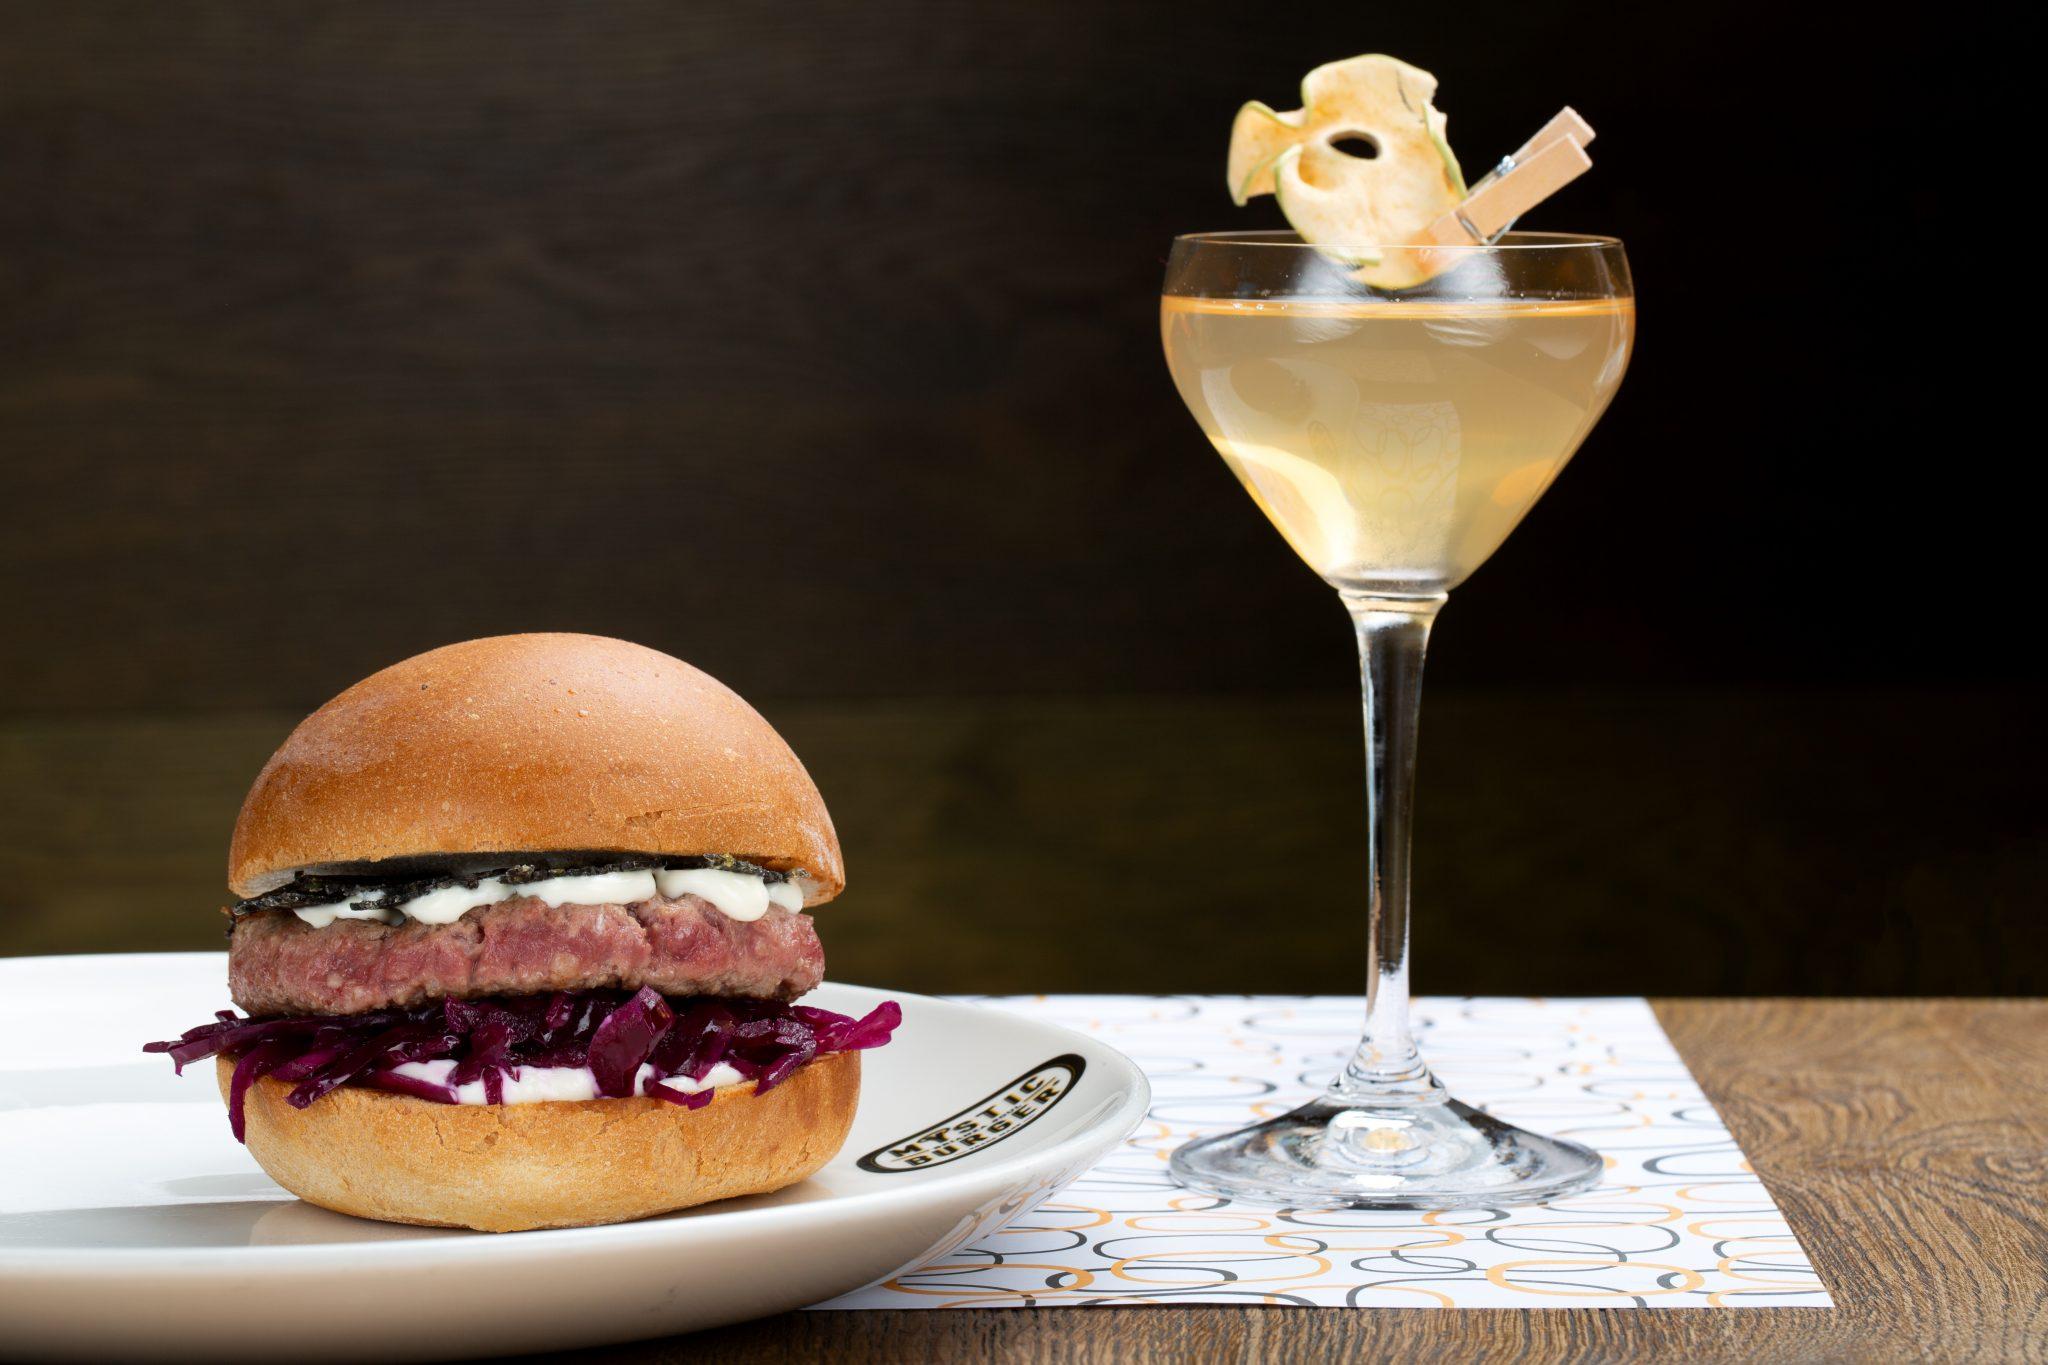 Mystic Burger, l'hamburger dall'anima italo-brianzola